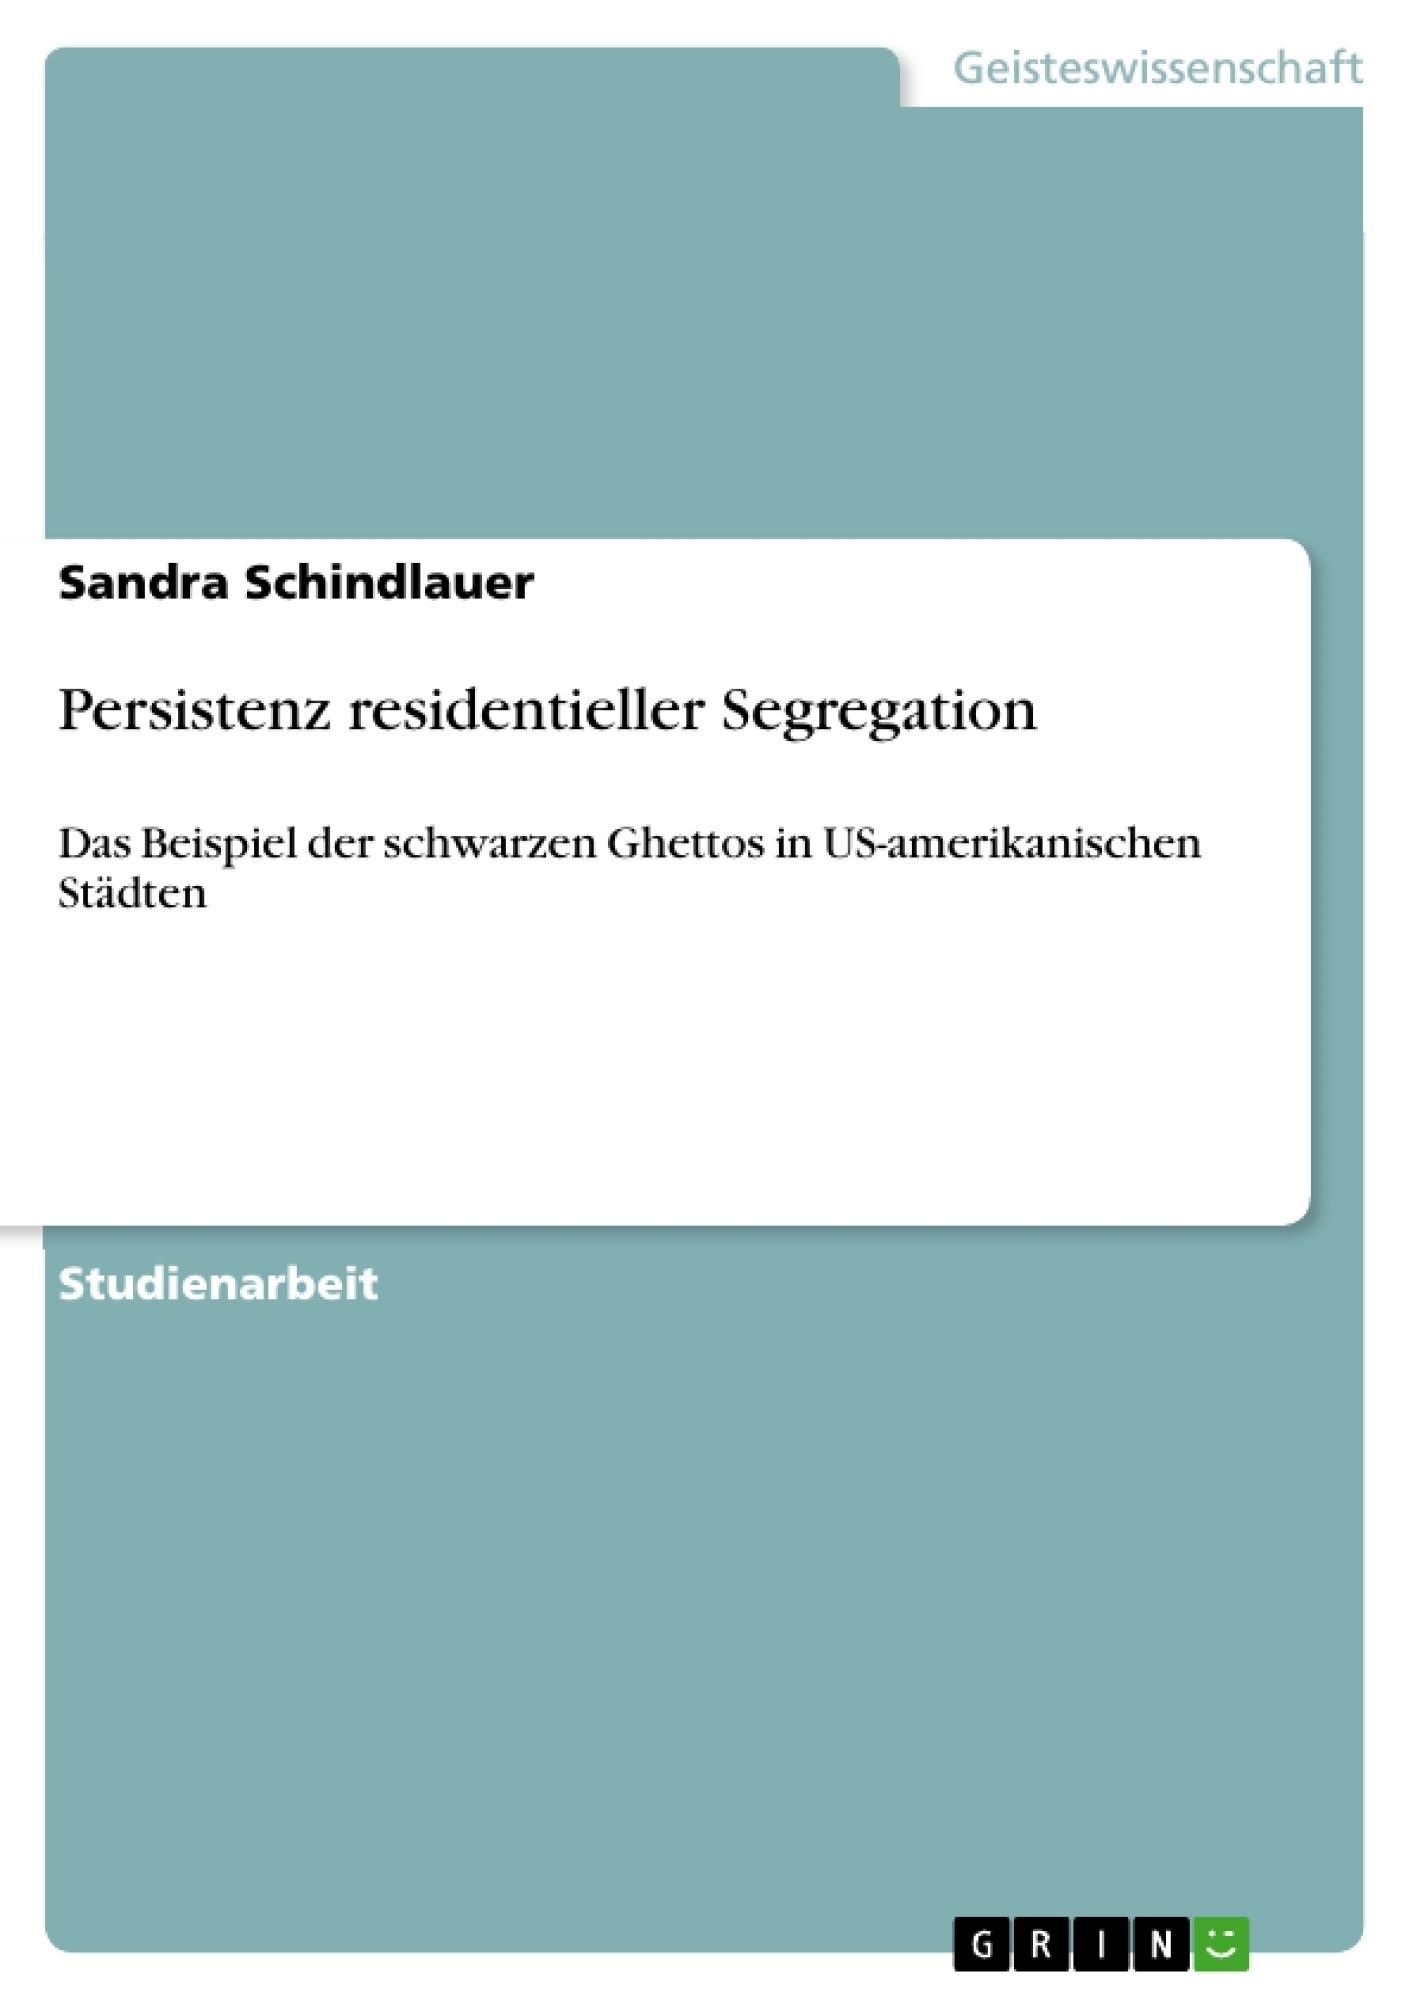 Titel: Persistenz residentieller Segregation